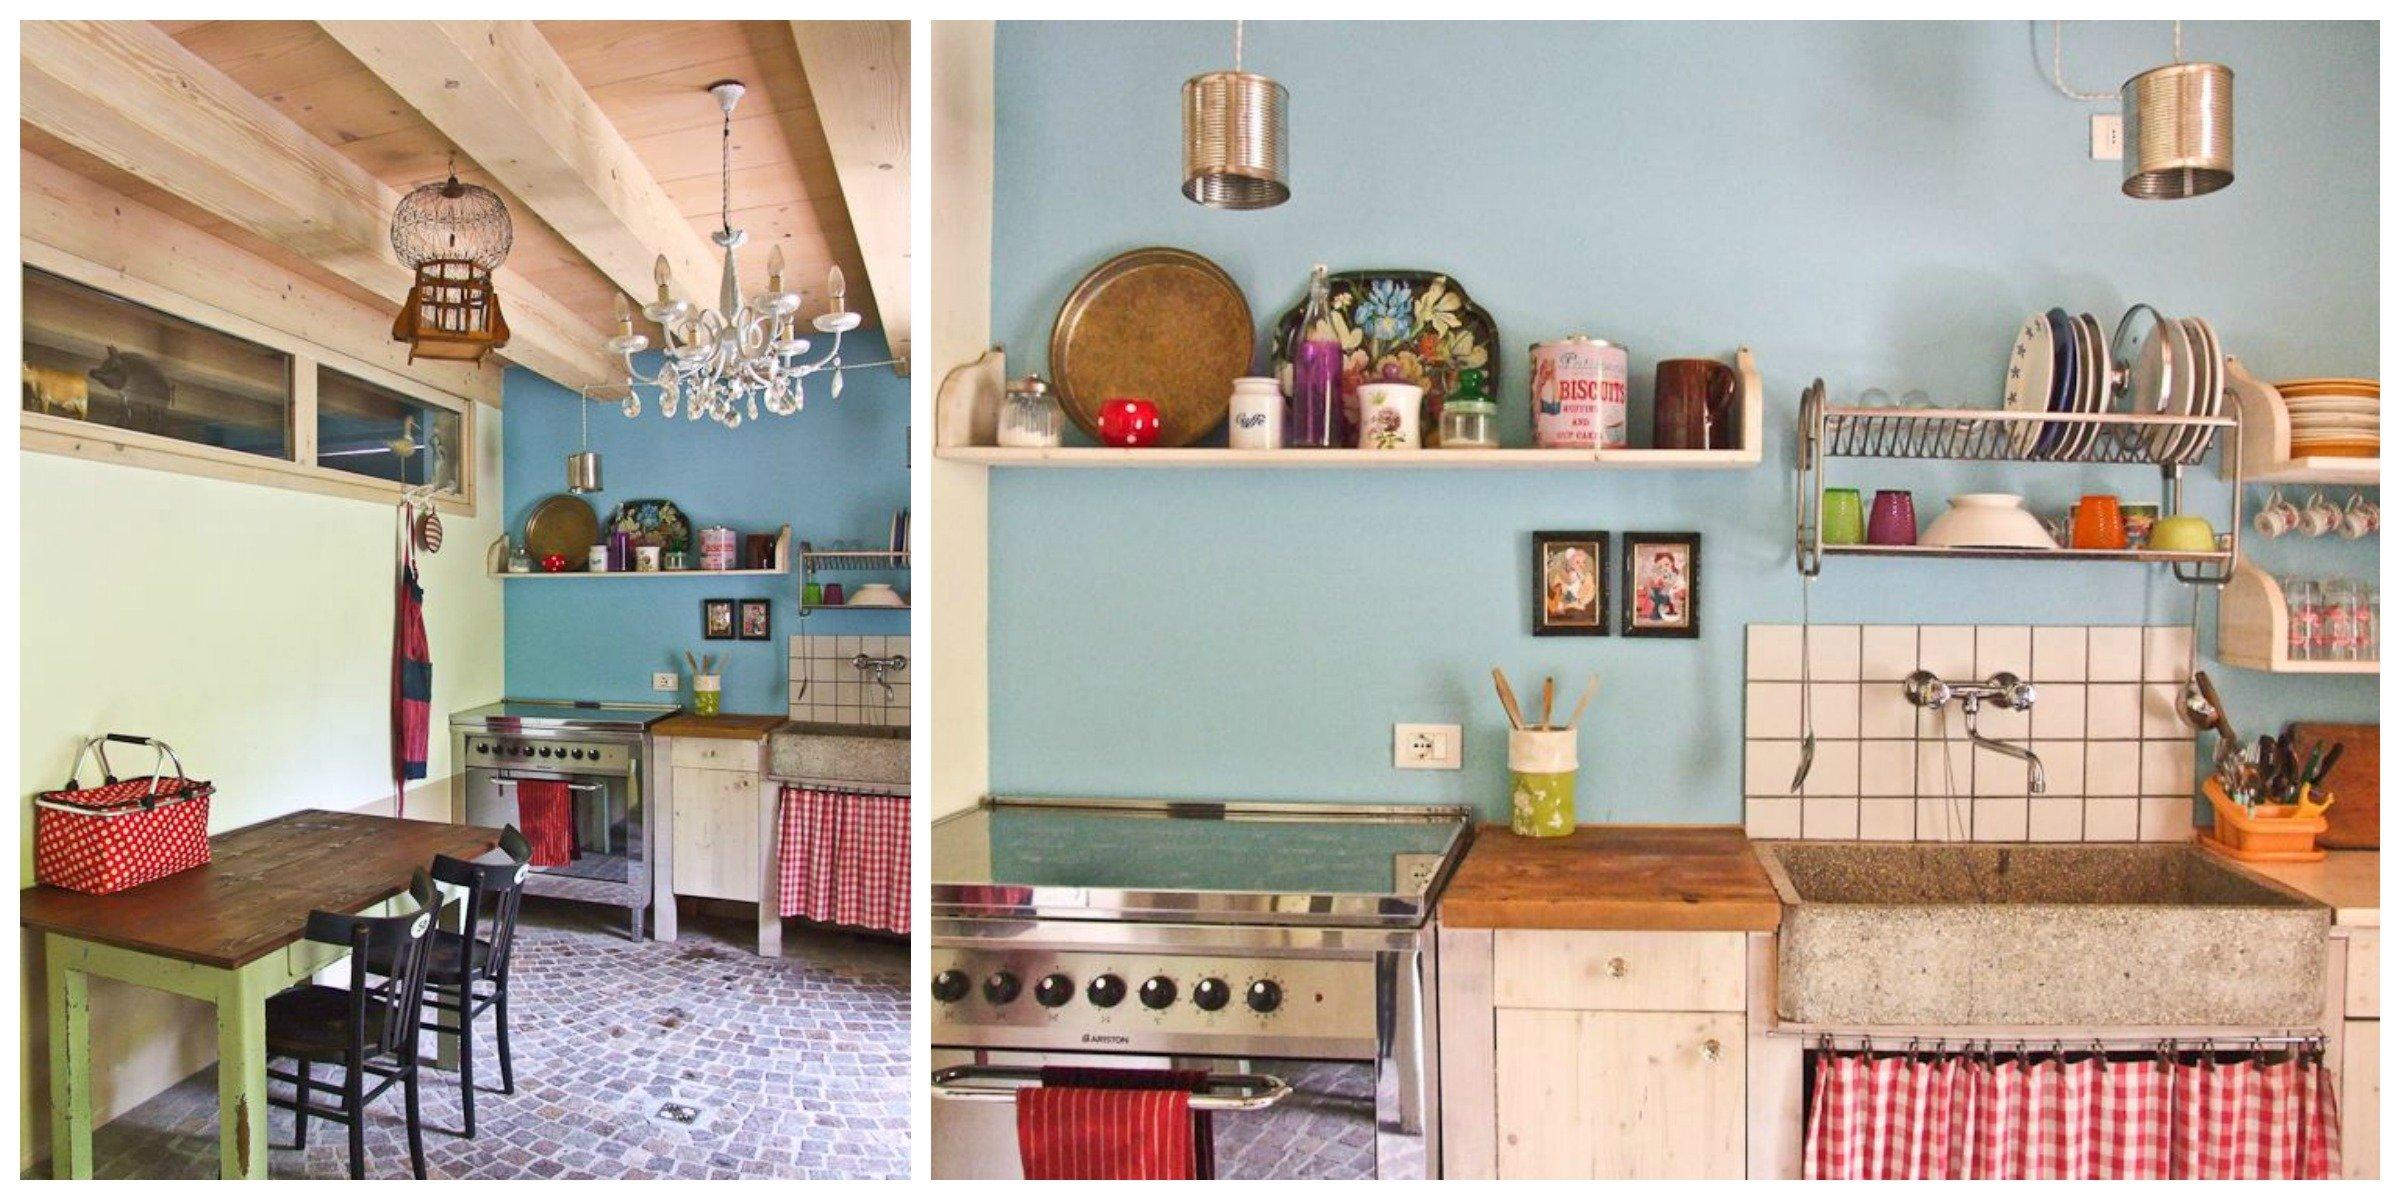 cucina in giardino - A Casa di Ro